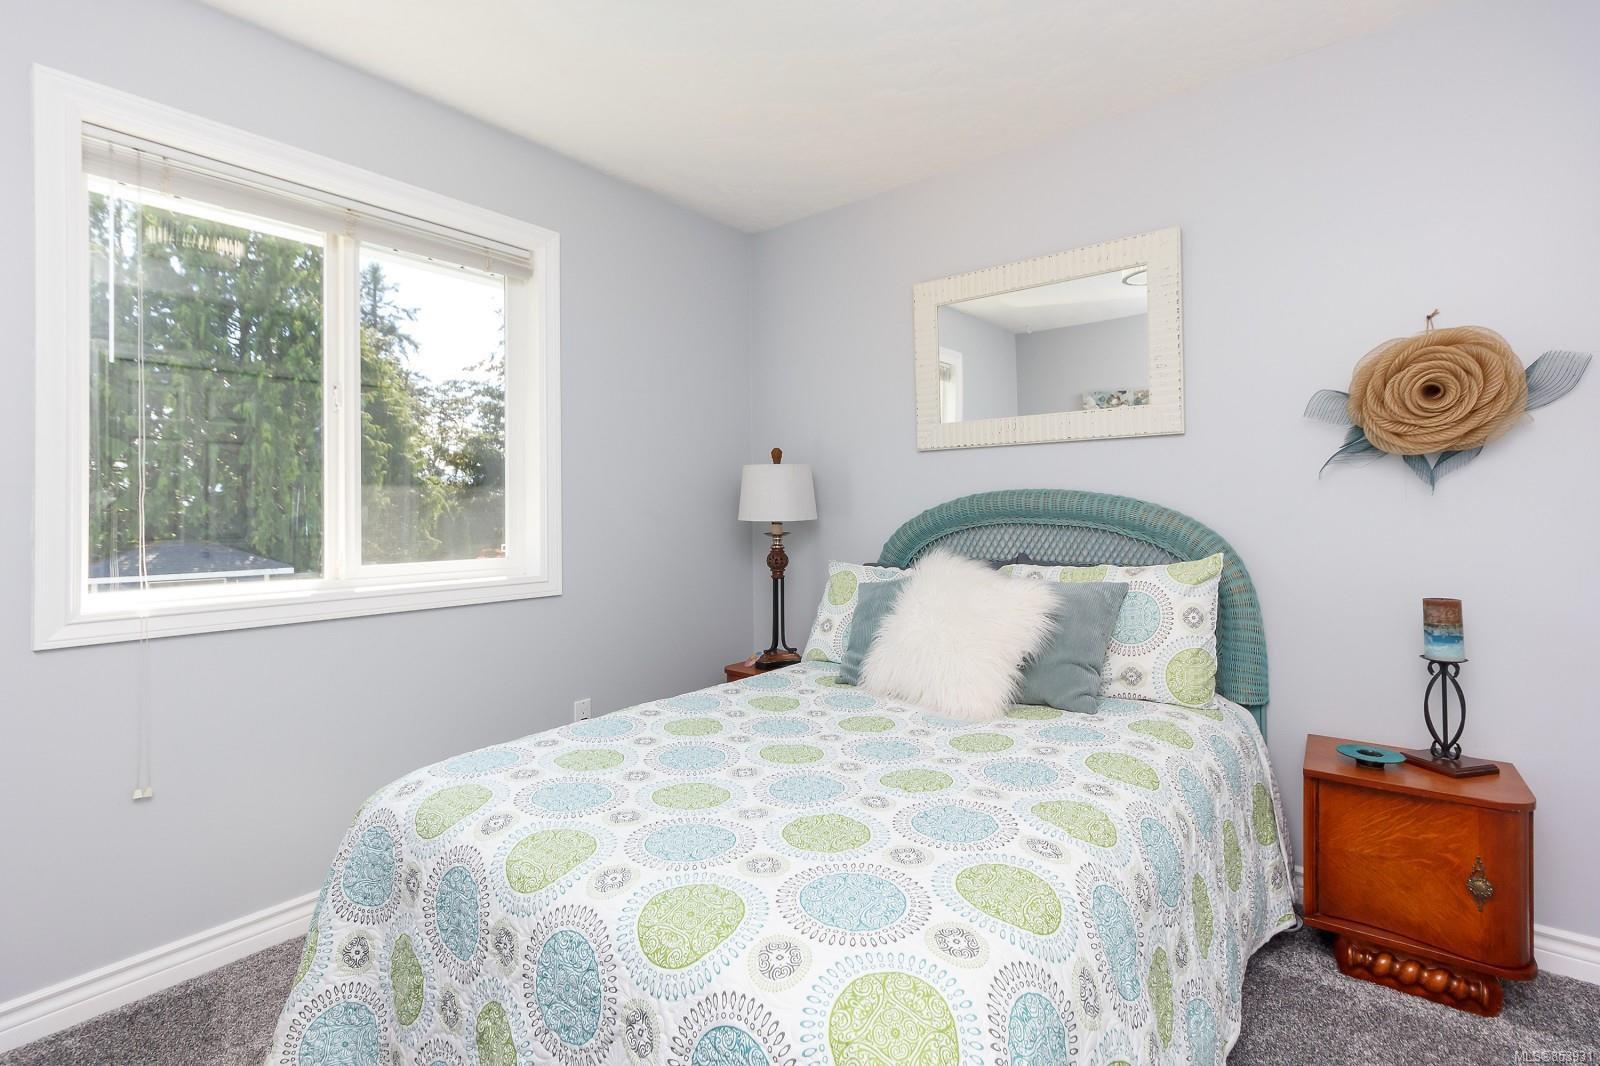 Photo 15: Photos: 2456 Timbercrest Dr in : Du East Duncan House for sale (Duncan)  : MLS®# 853931